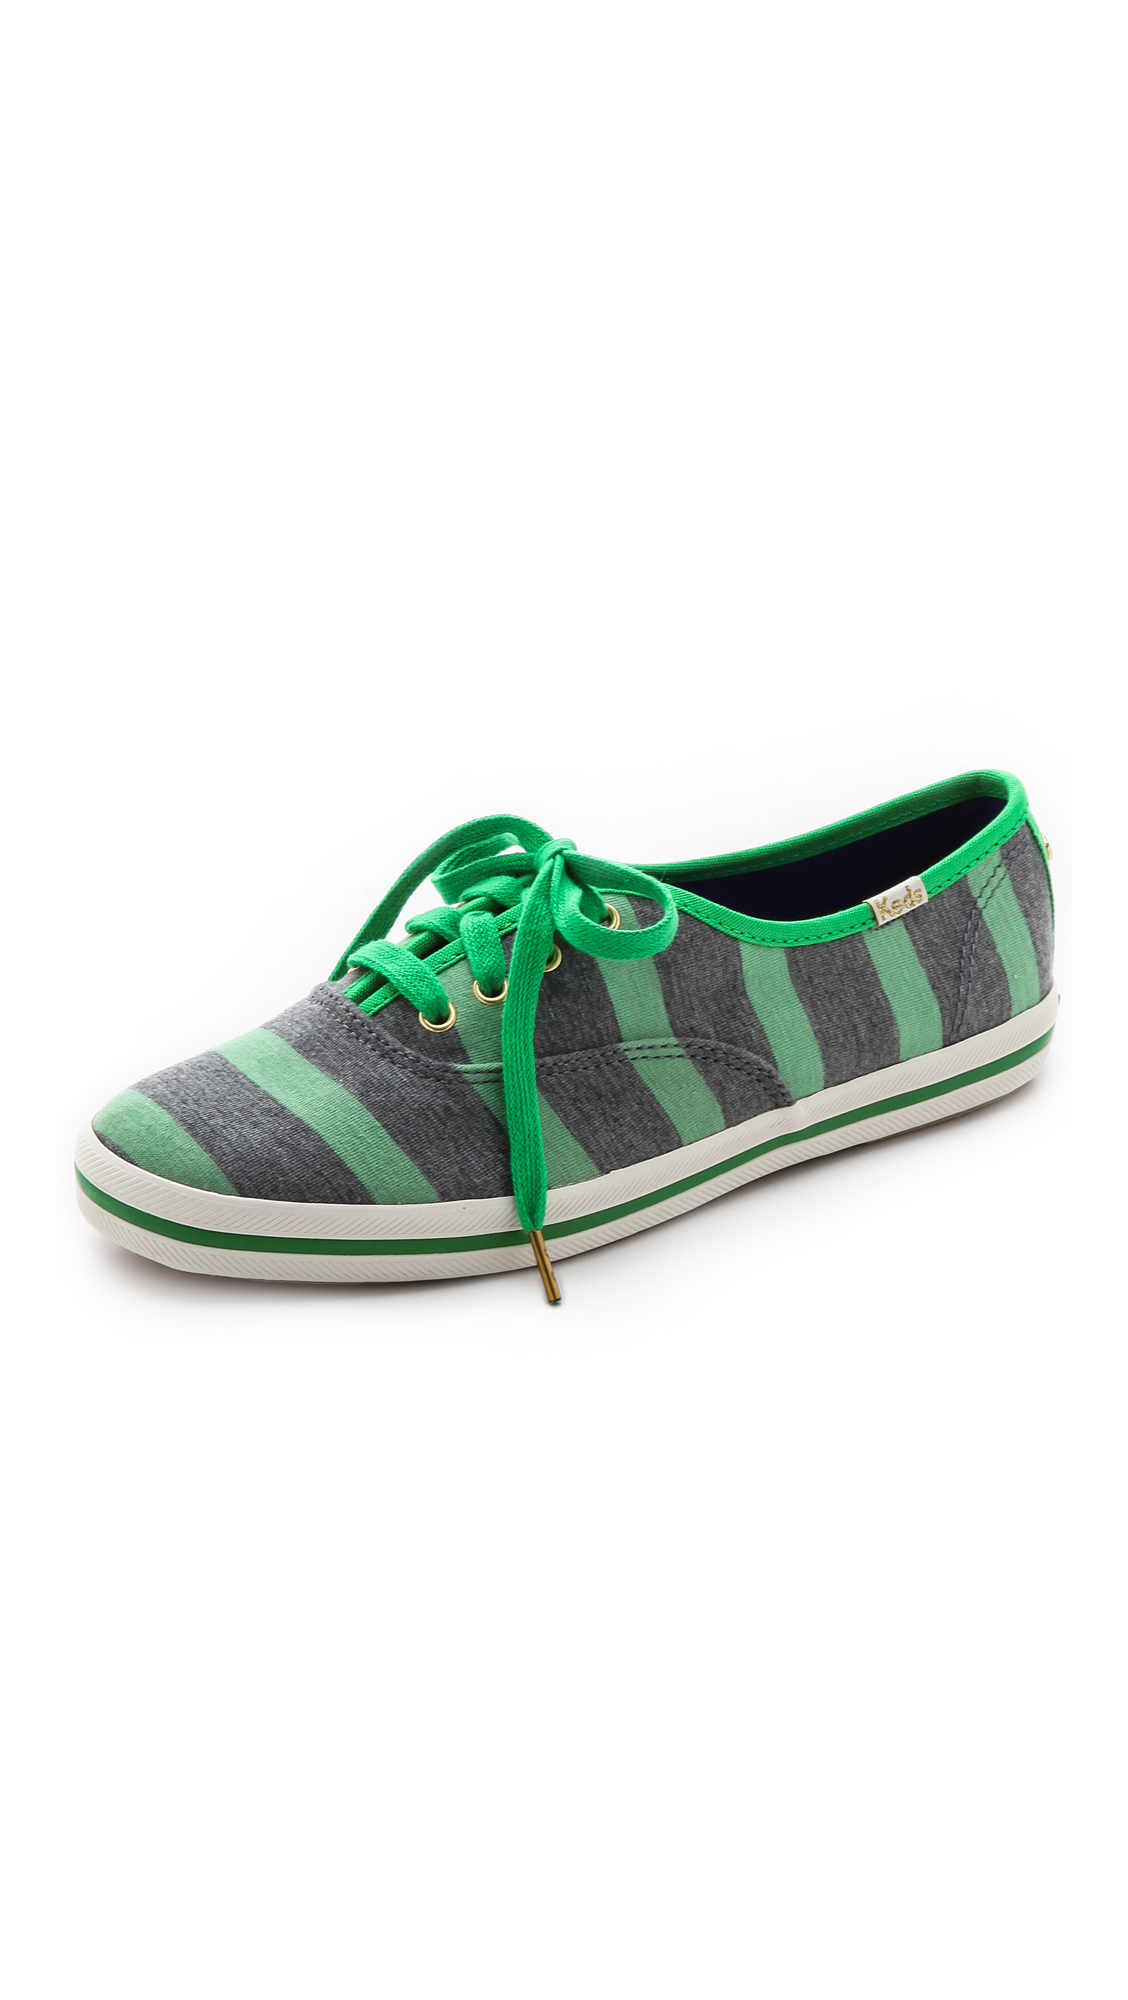 Kate Spade Keds For Kate Spade Kick Striped Sneakers - Metropolis Green